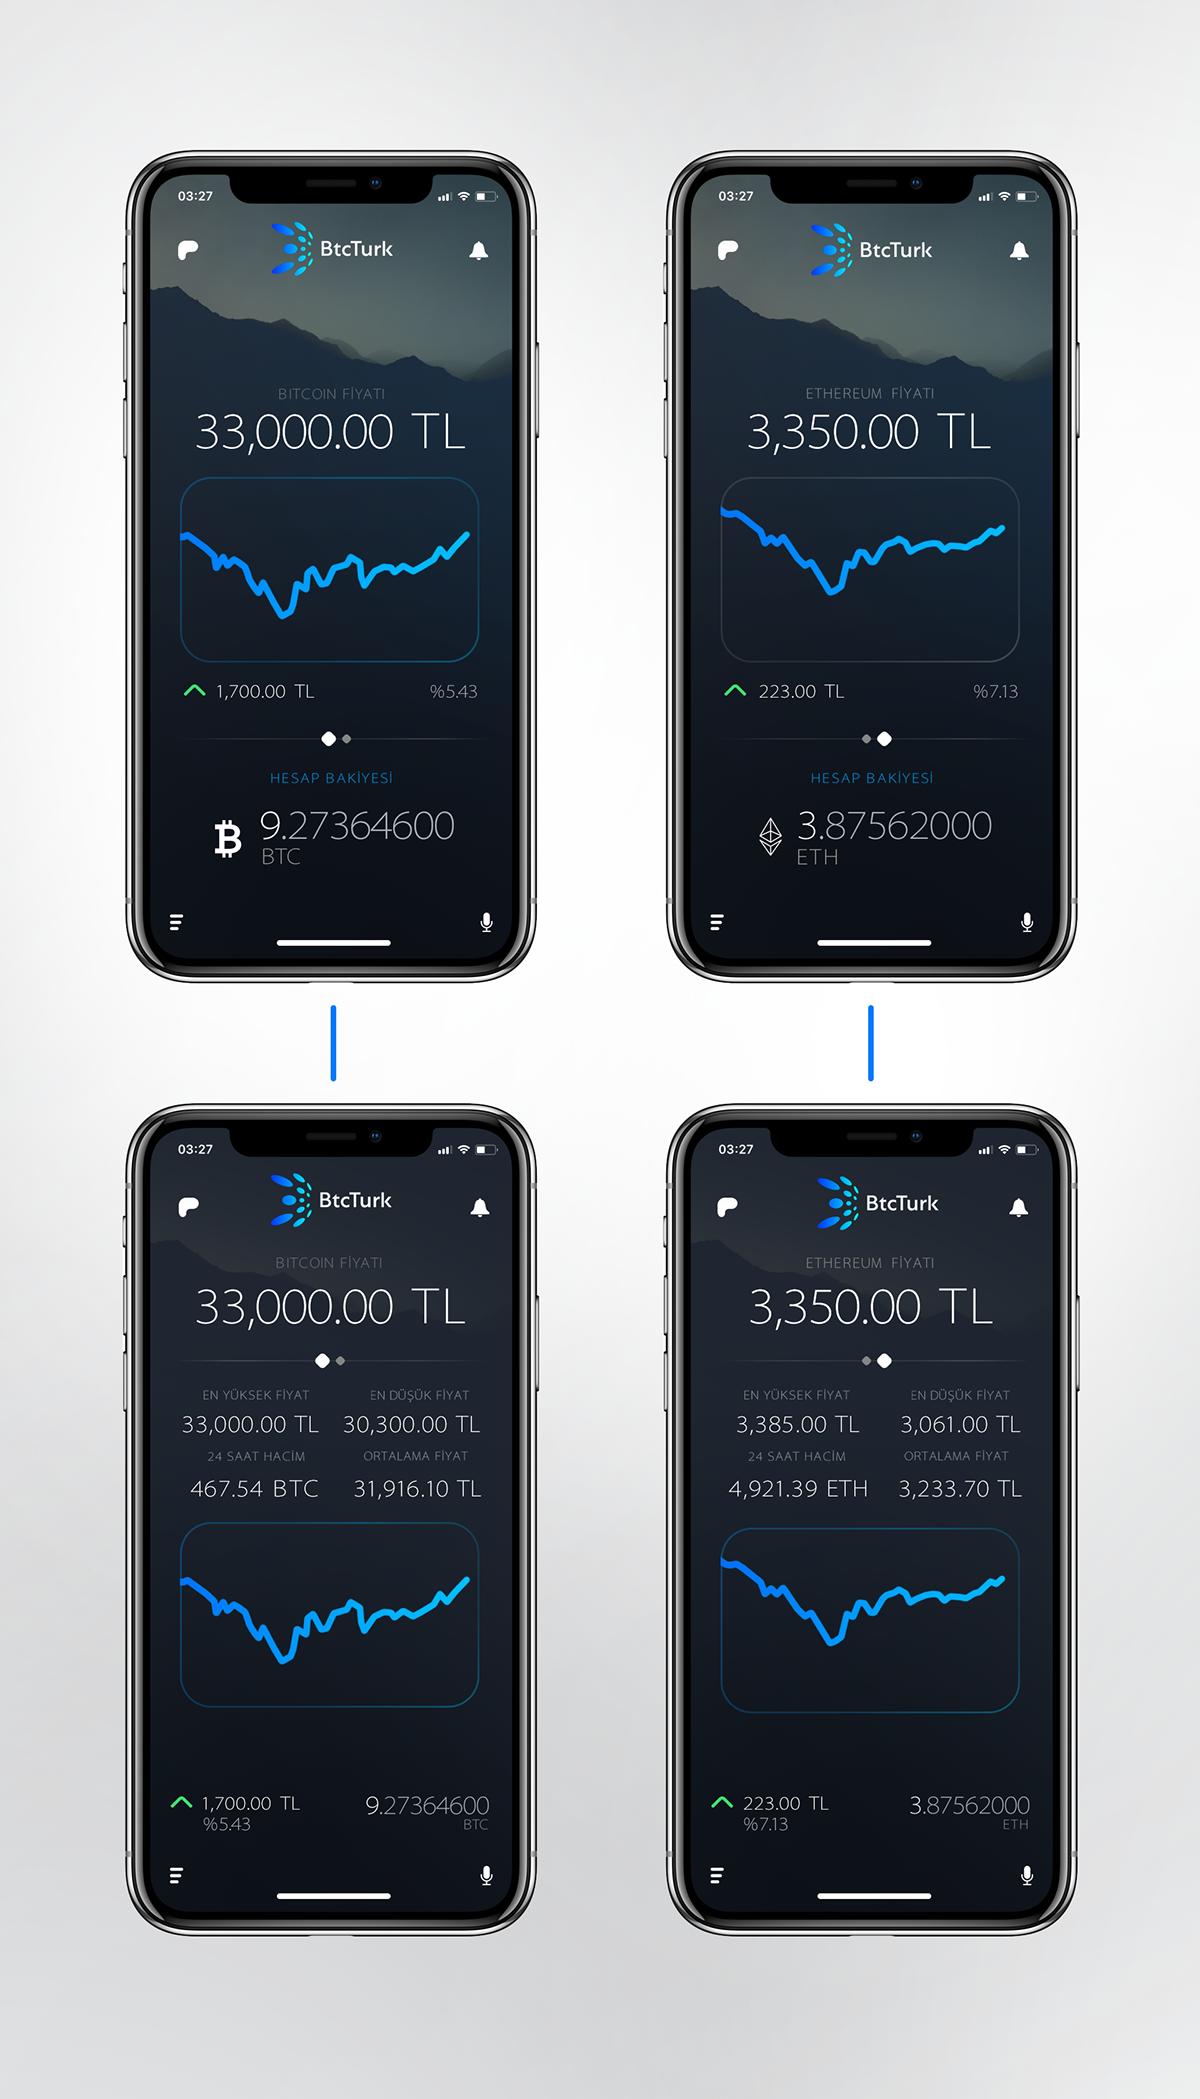 bitcoin iphone x